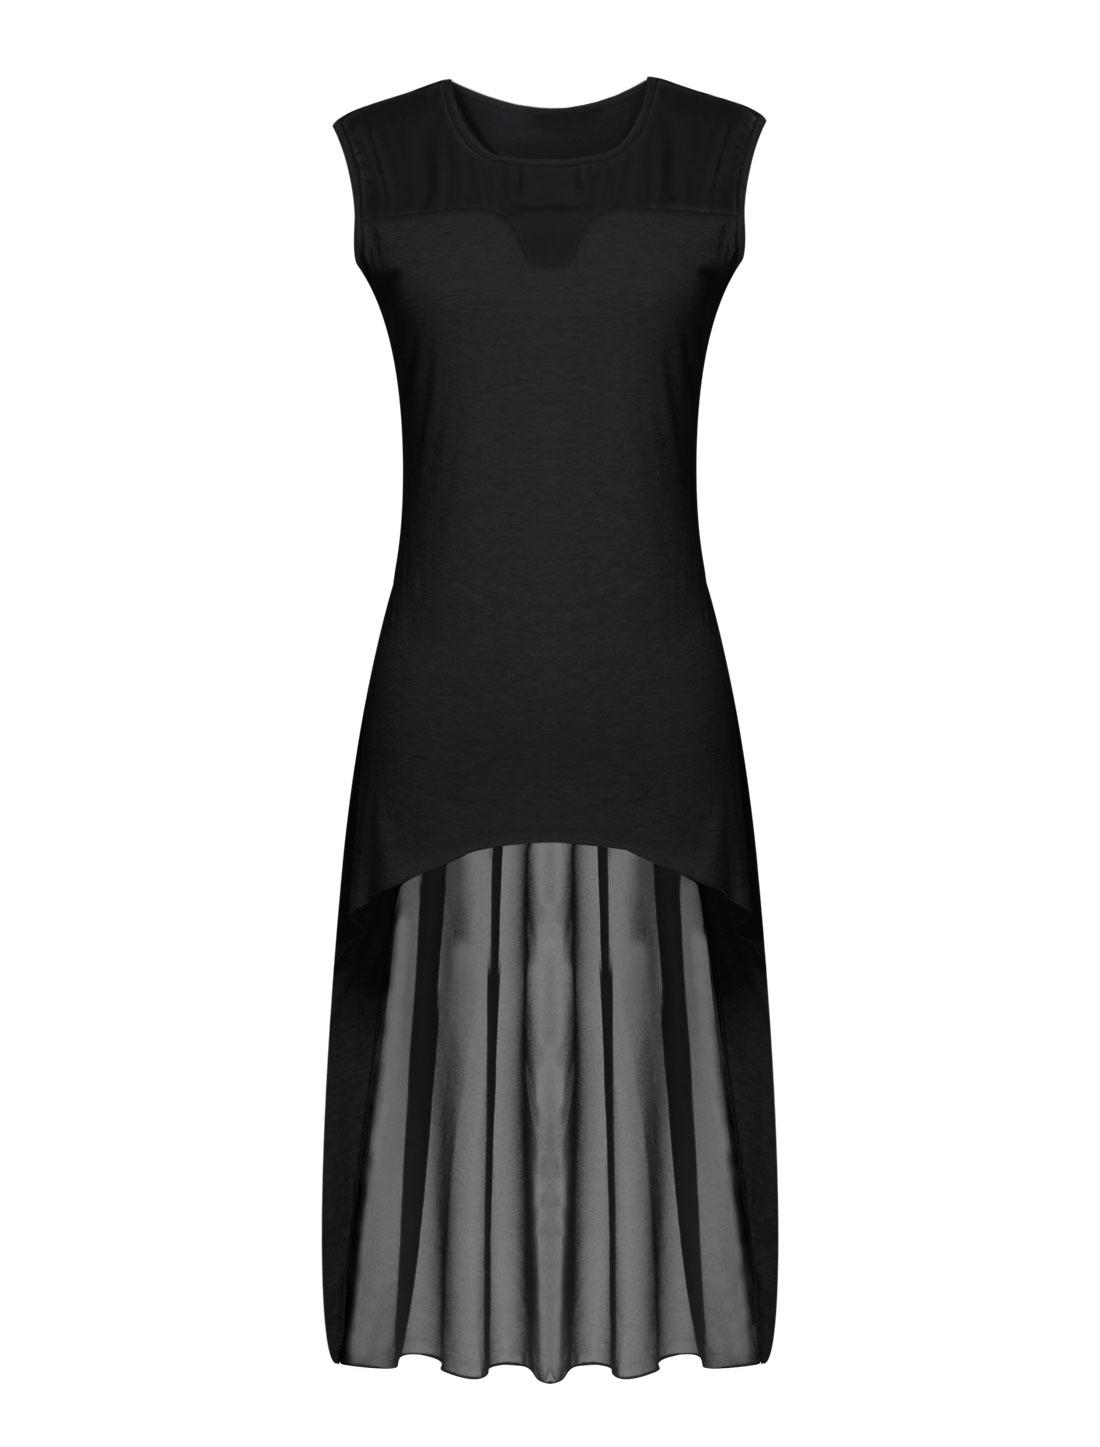 Lady Sleeveless Chiffon Panel Semi Sheer High Low Hem Tunic Top Black M